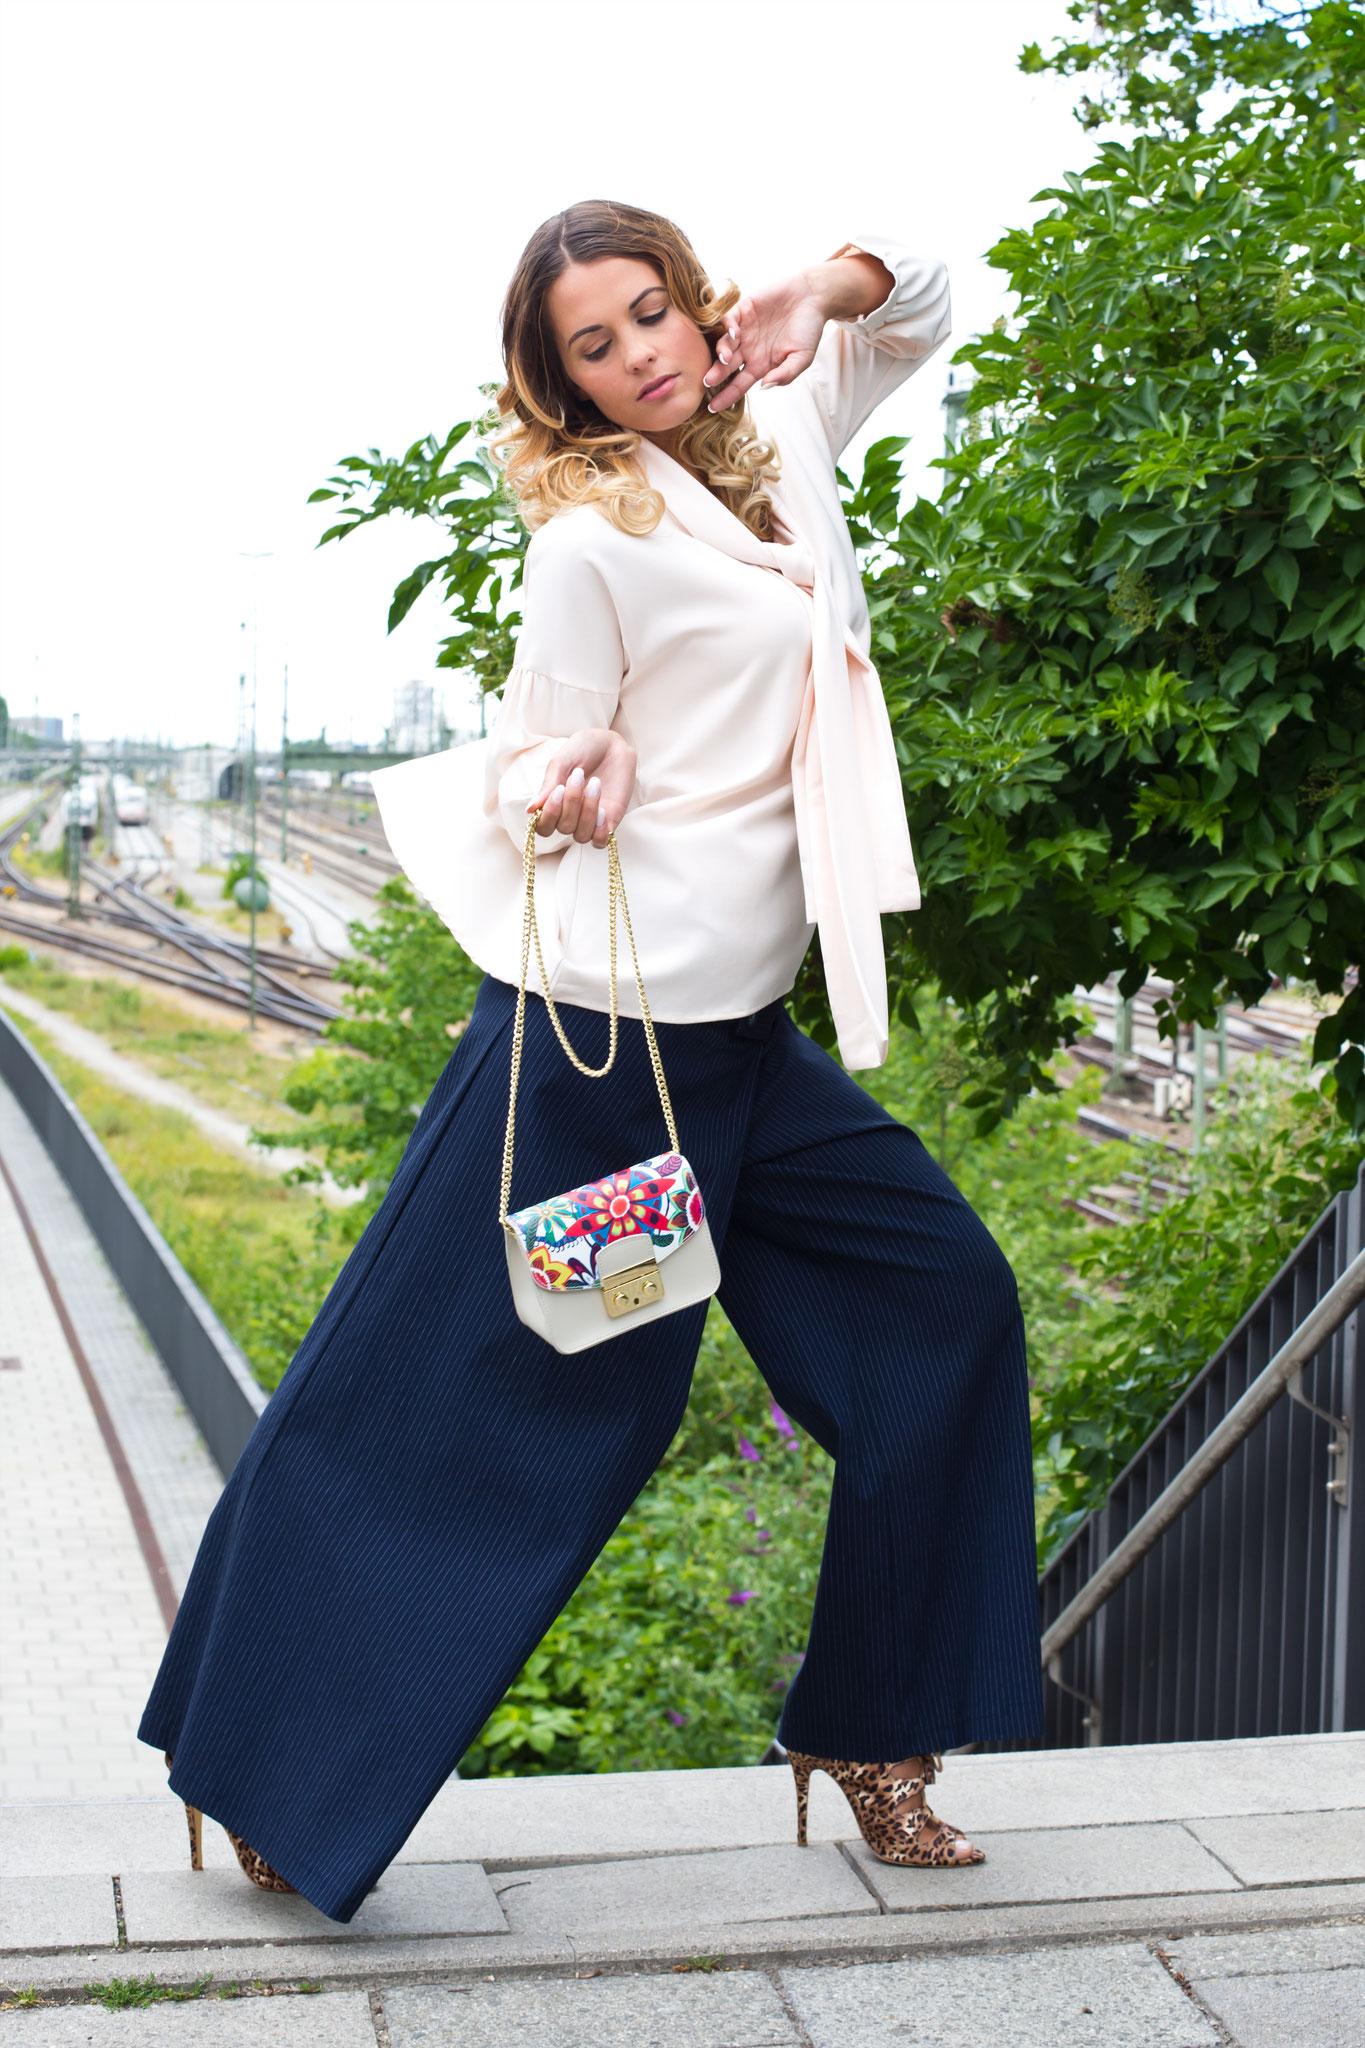 Carnival of Colours - SHEEBA UK, September 2017 VOL I - Fashion Stylist: Vesna Resch